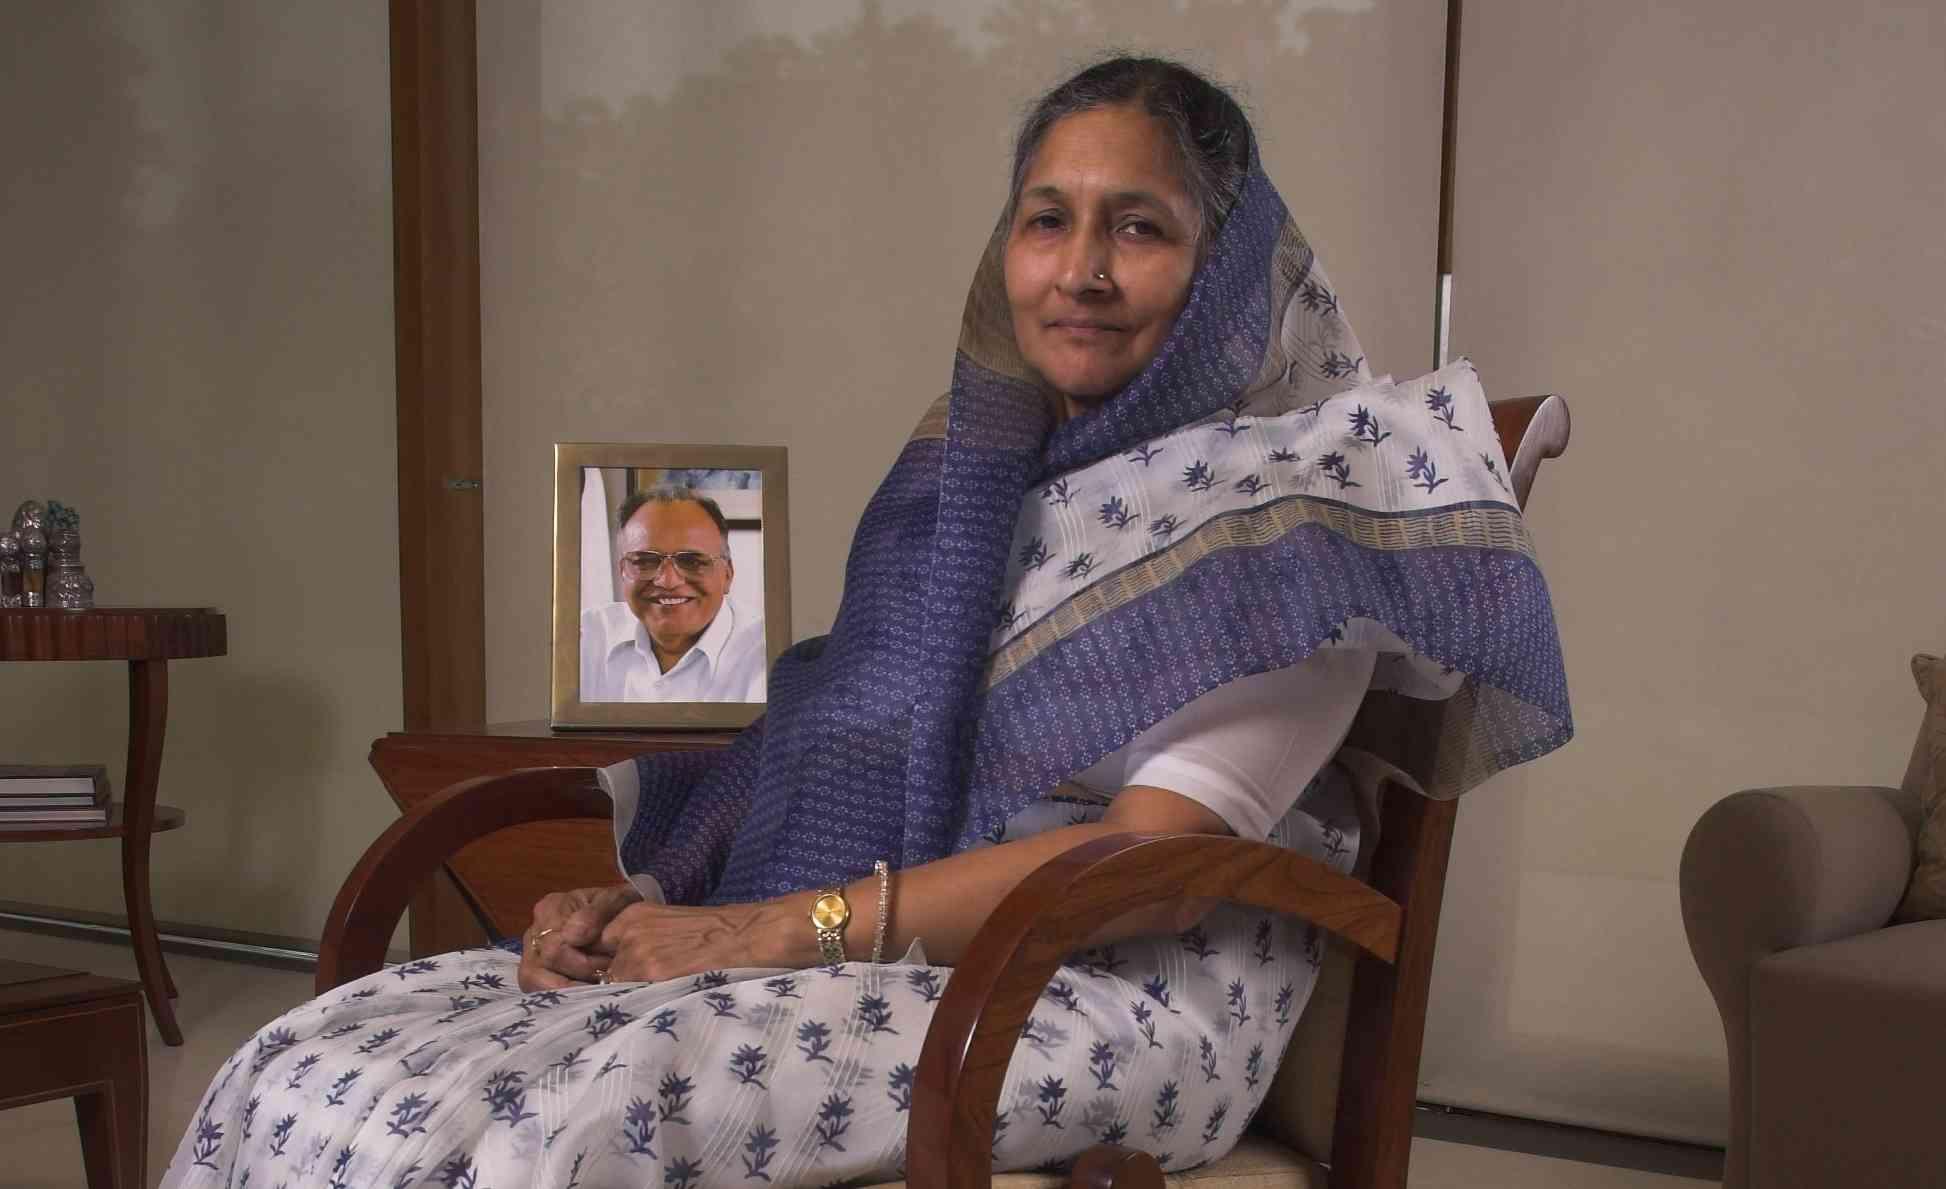 PunjabKesari, Savitri Jindle